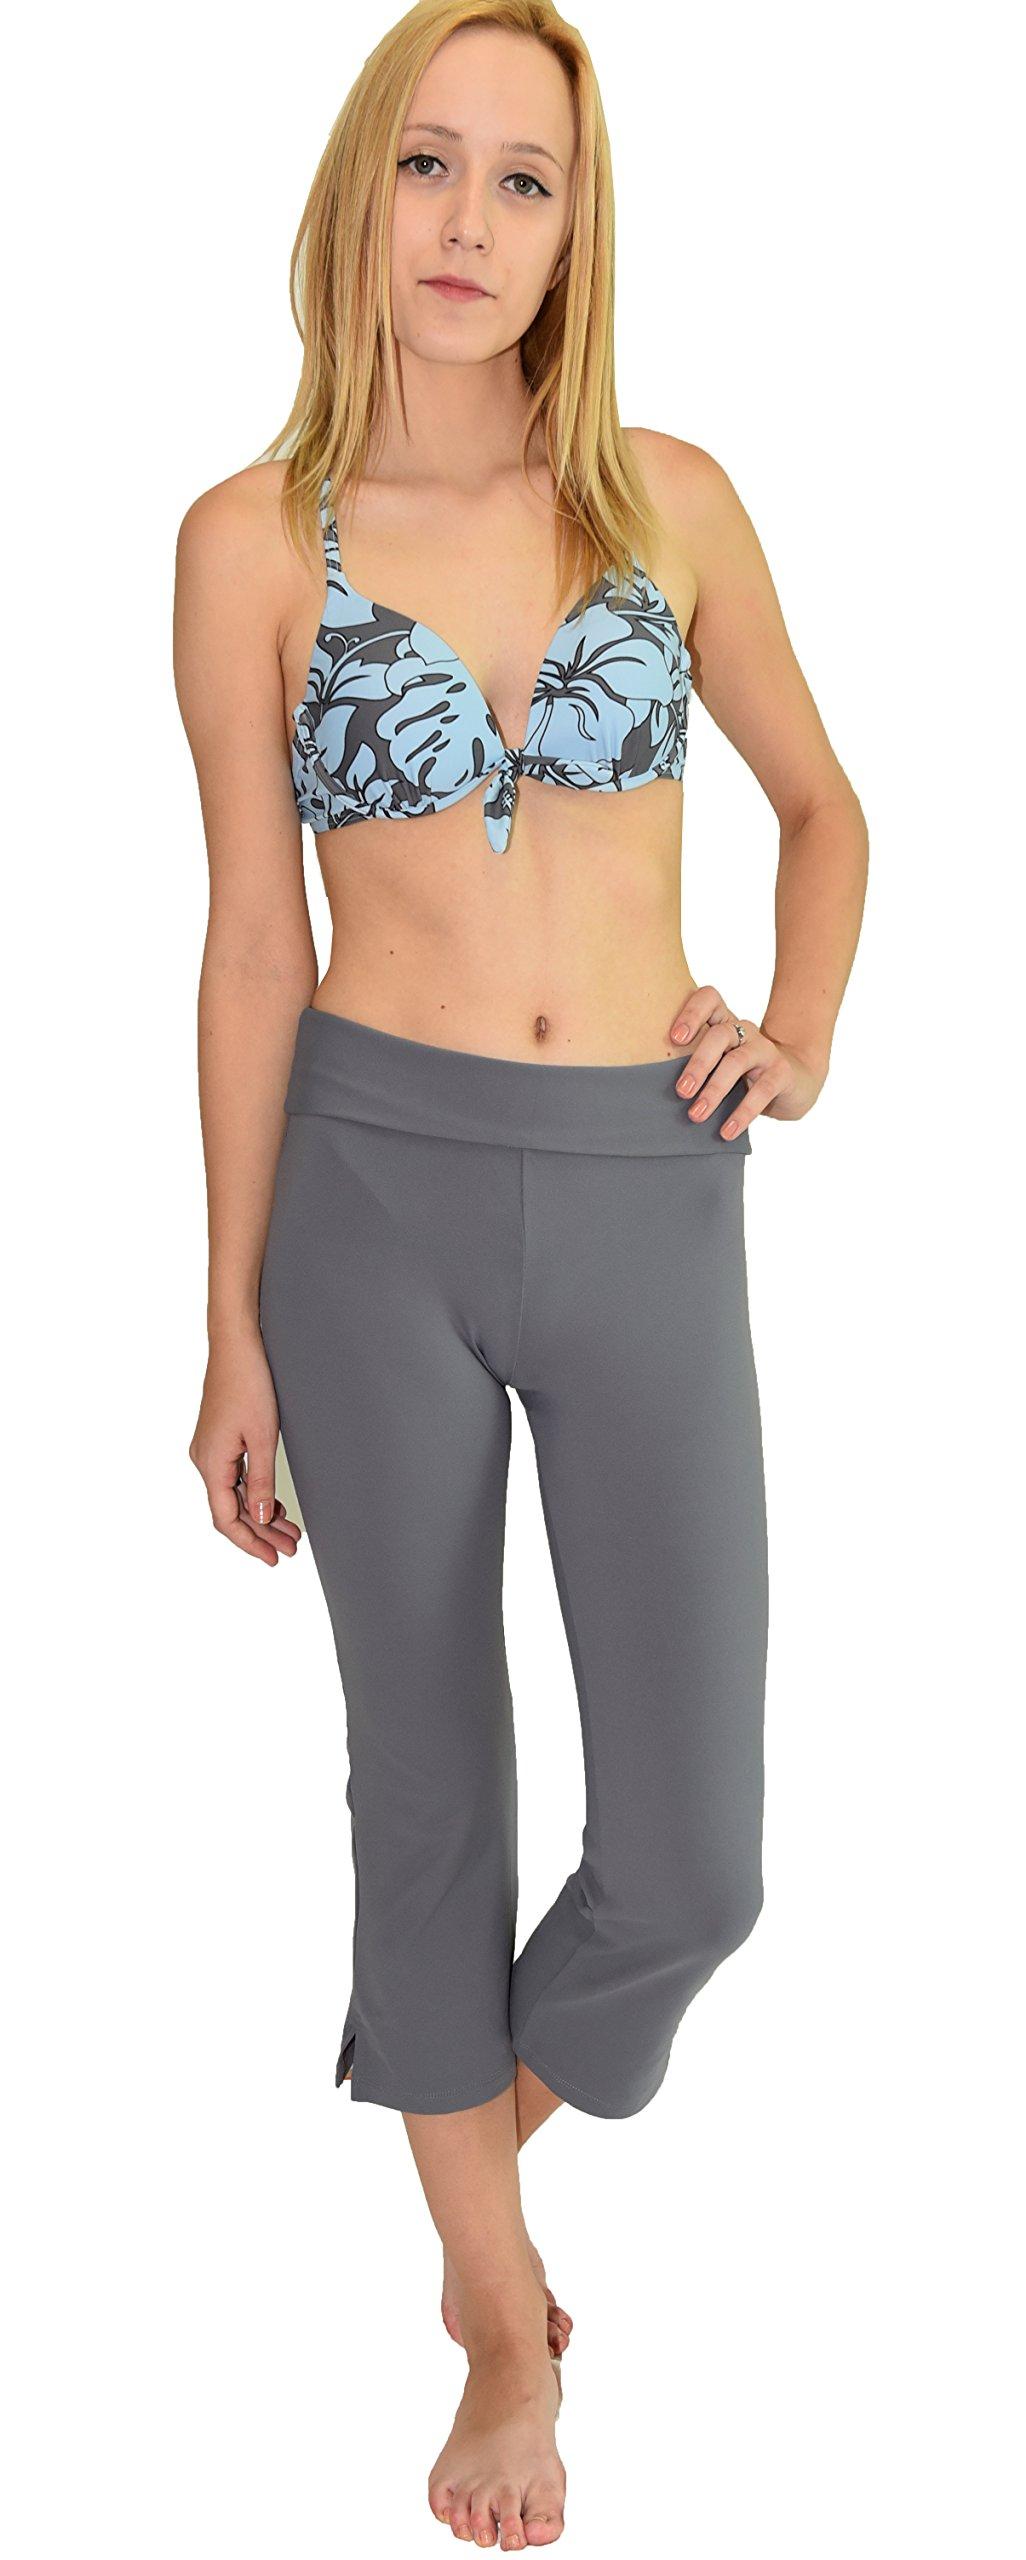 Private Island Women UV Swim Rash Guard Capri Bootcut Pants Yoga (XXXL, Grey) by Private Island